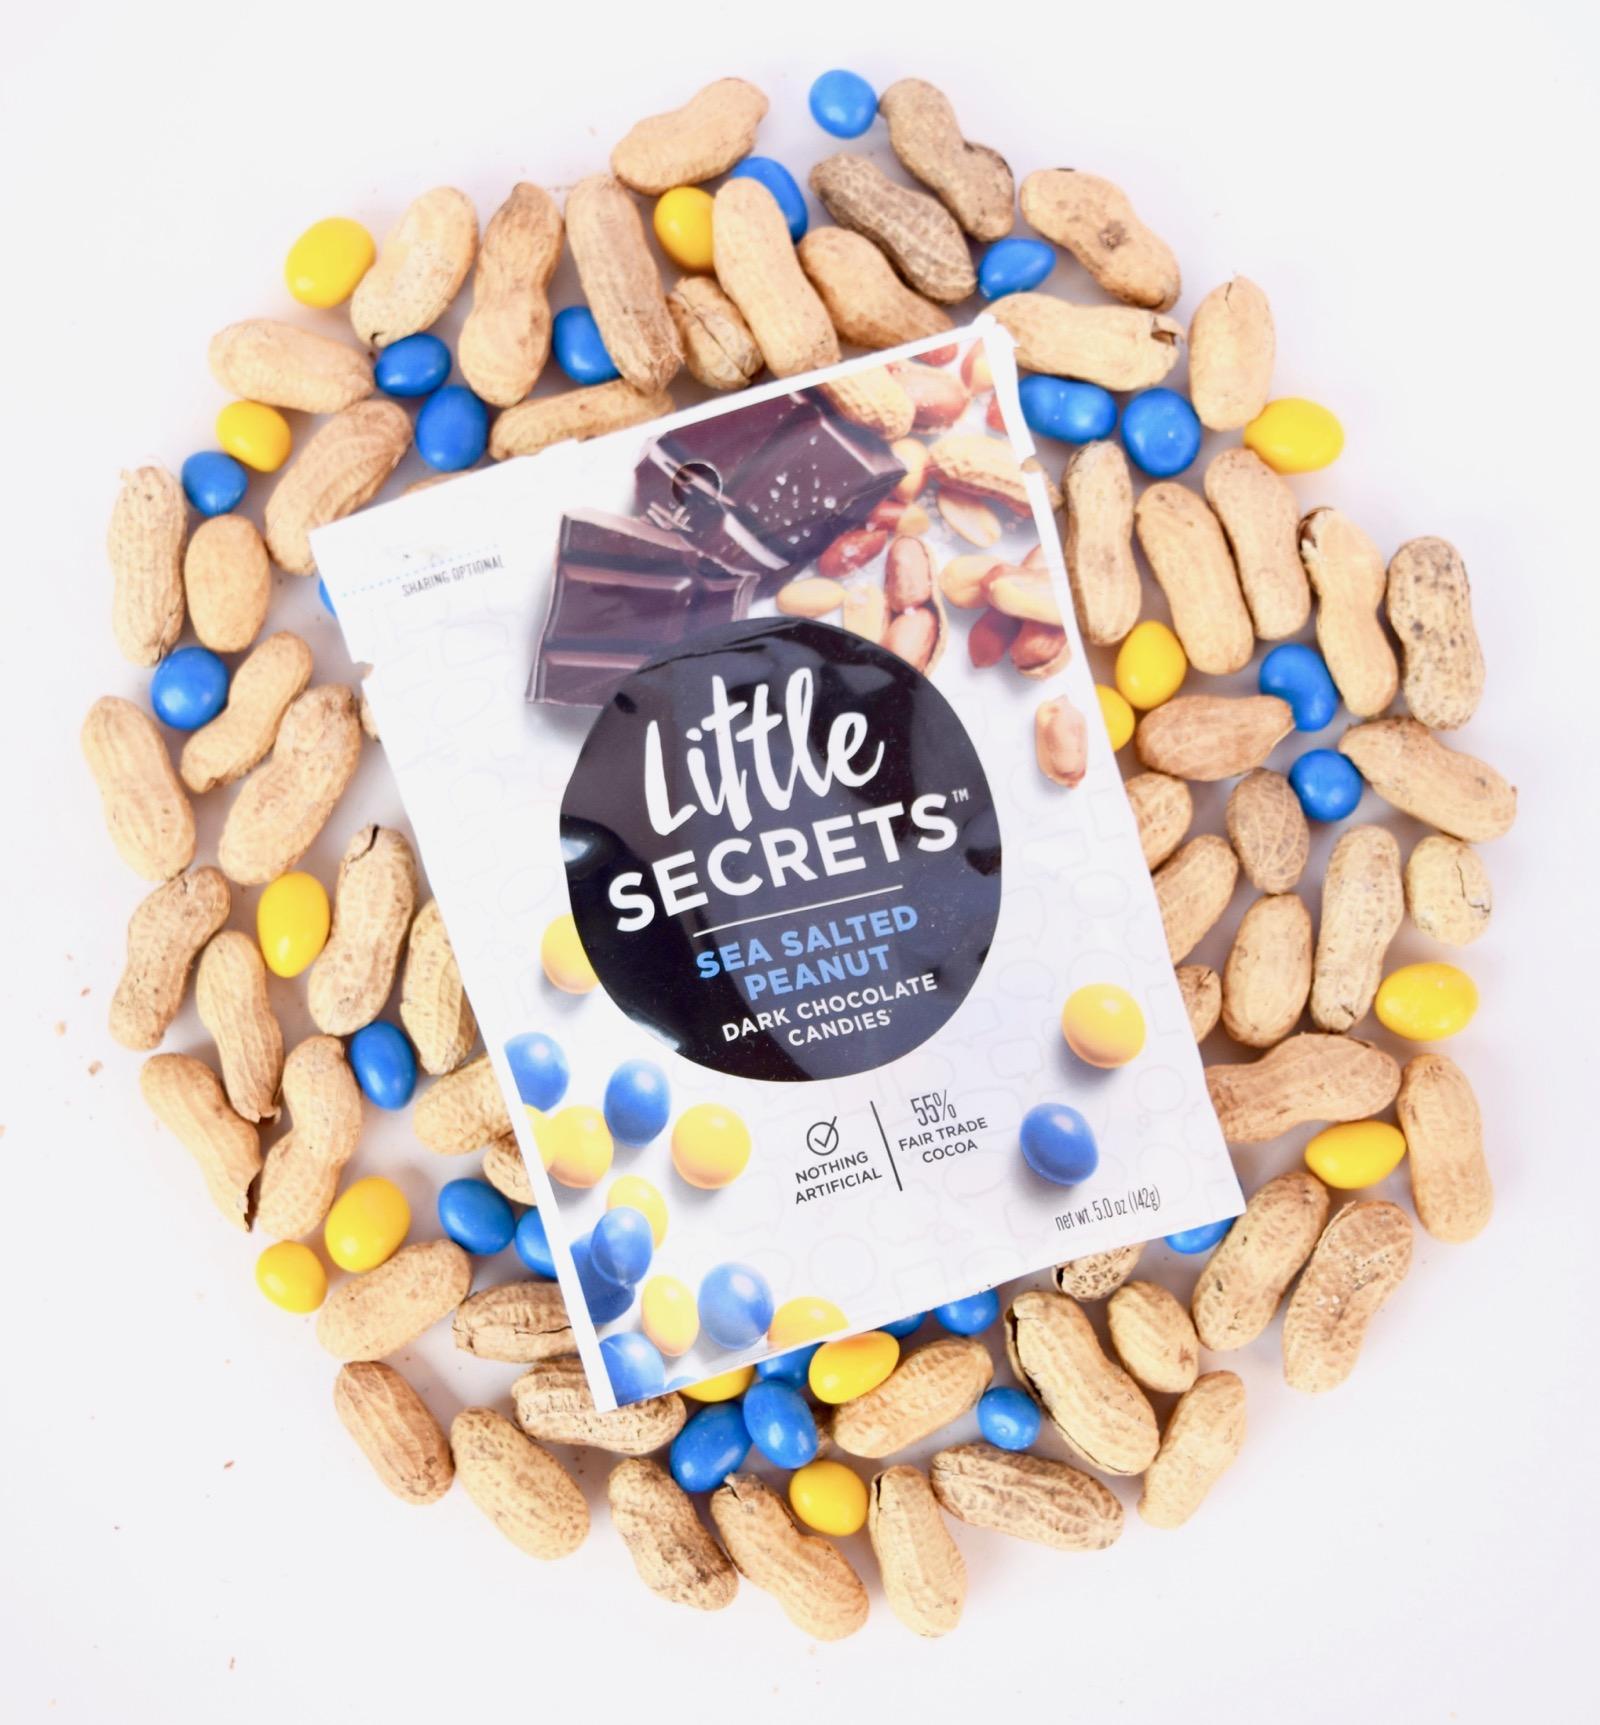 Little Secrets Chocolate